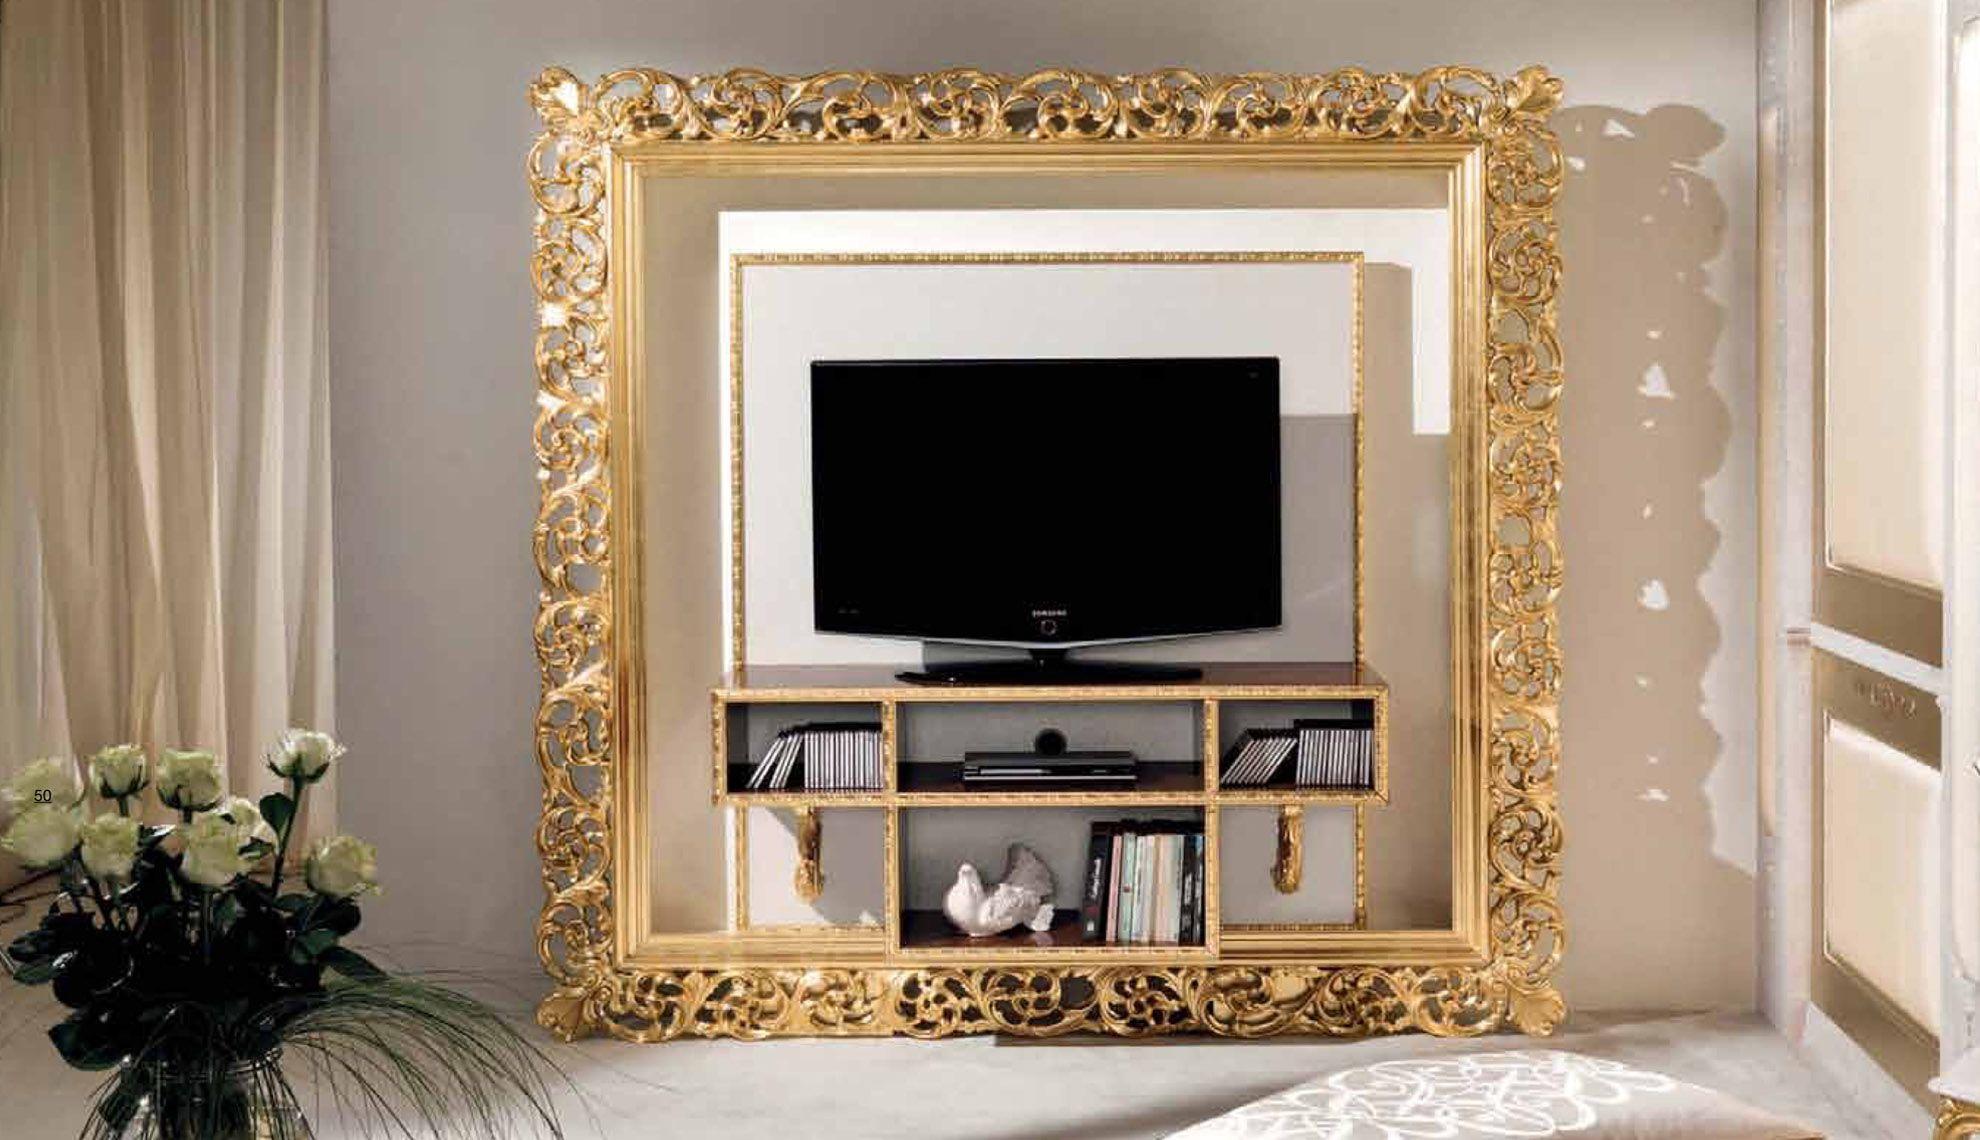 Apprendre L Anglais Grace A Des Dessins Animes Living Room Tv Stand Home Tv Stand Tv Stand Designs